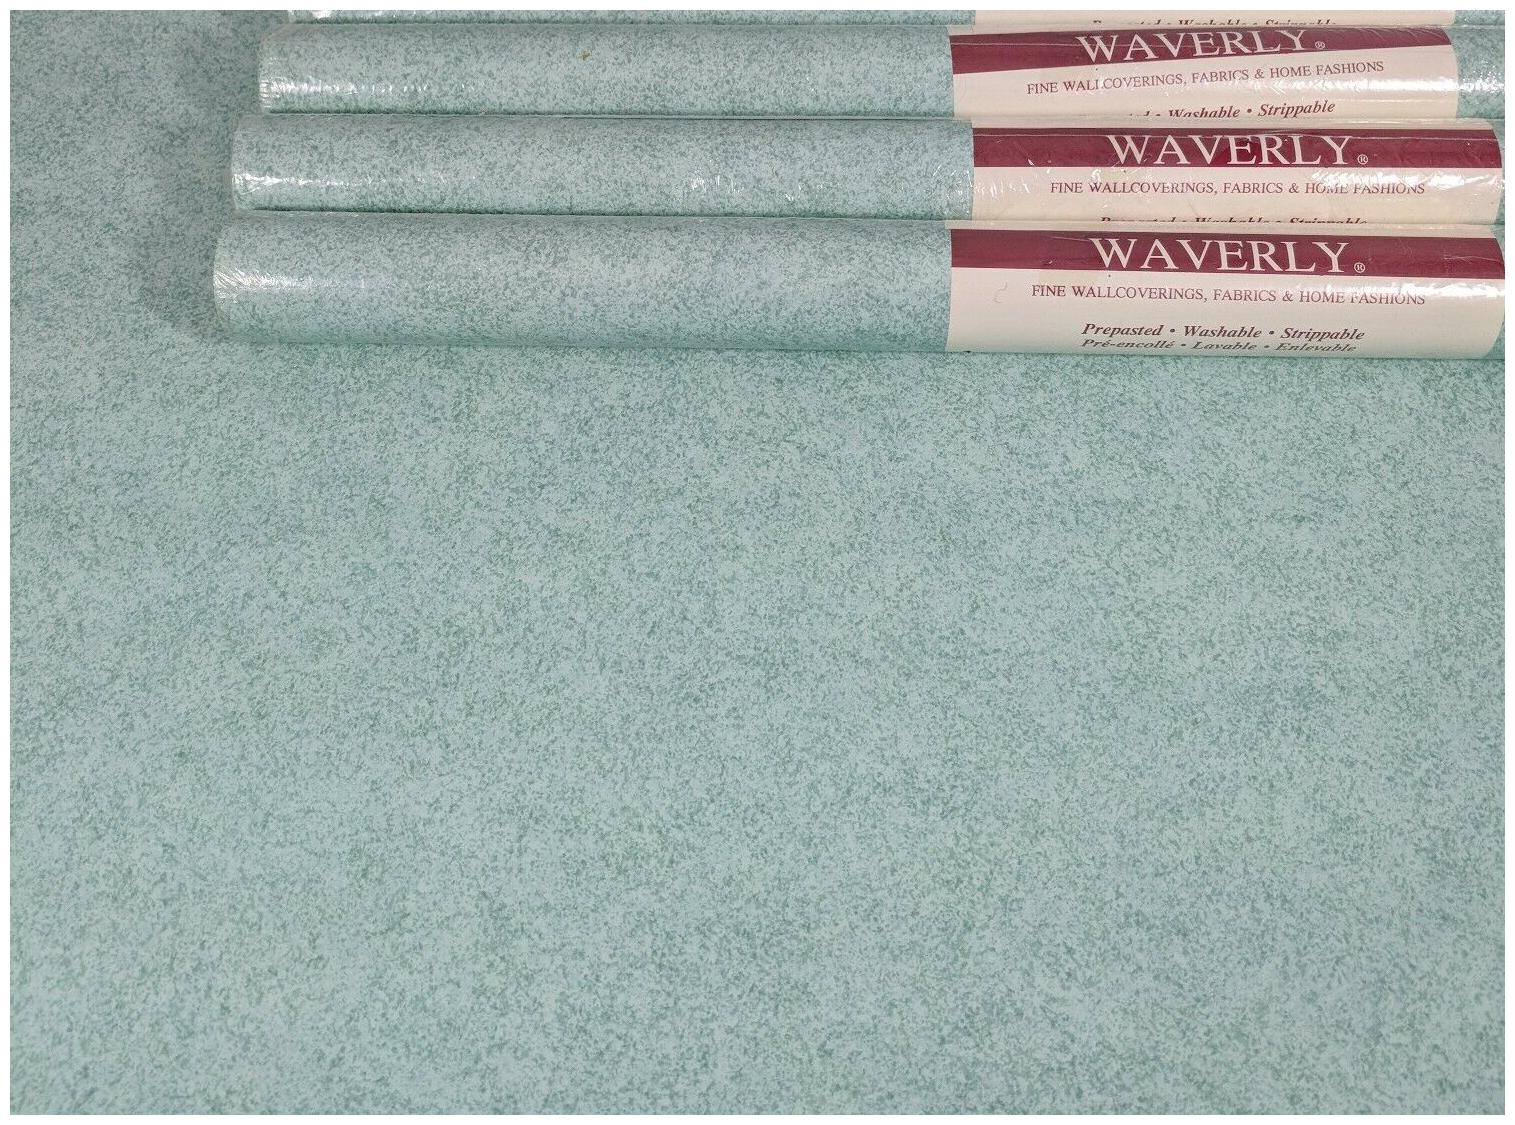 Waverly Wallpaper Border Green White Gingham Check Plaid 5.25 inch